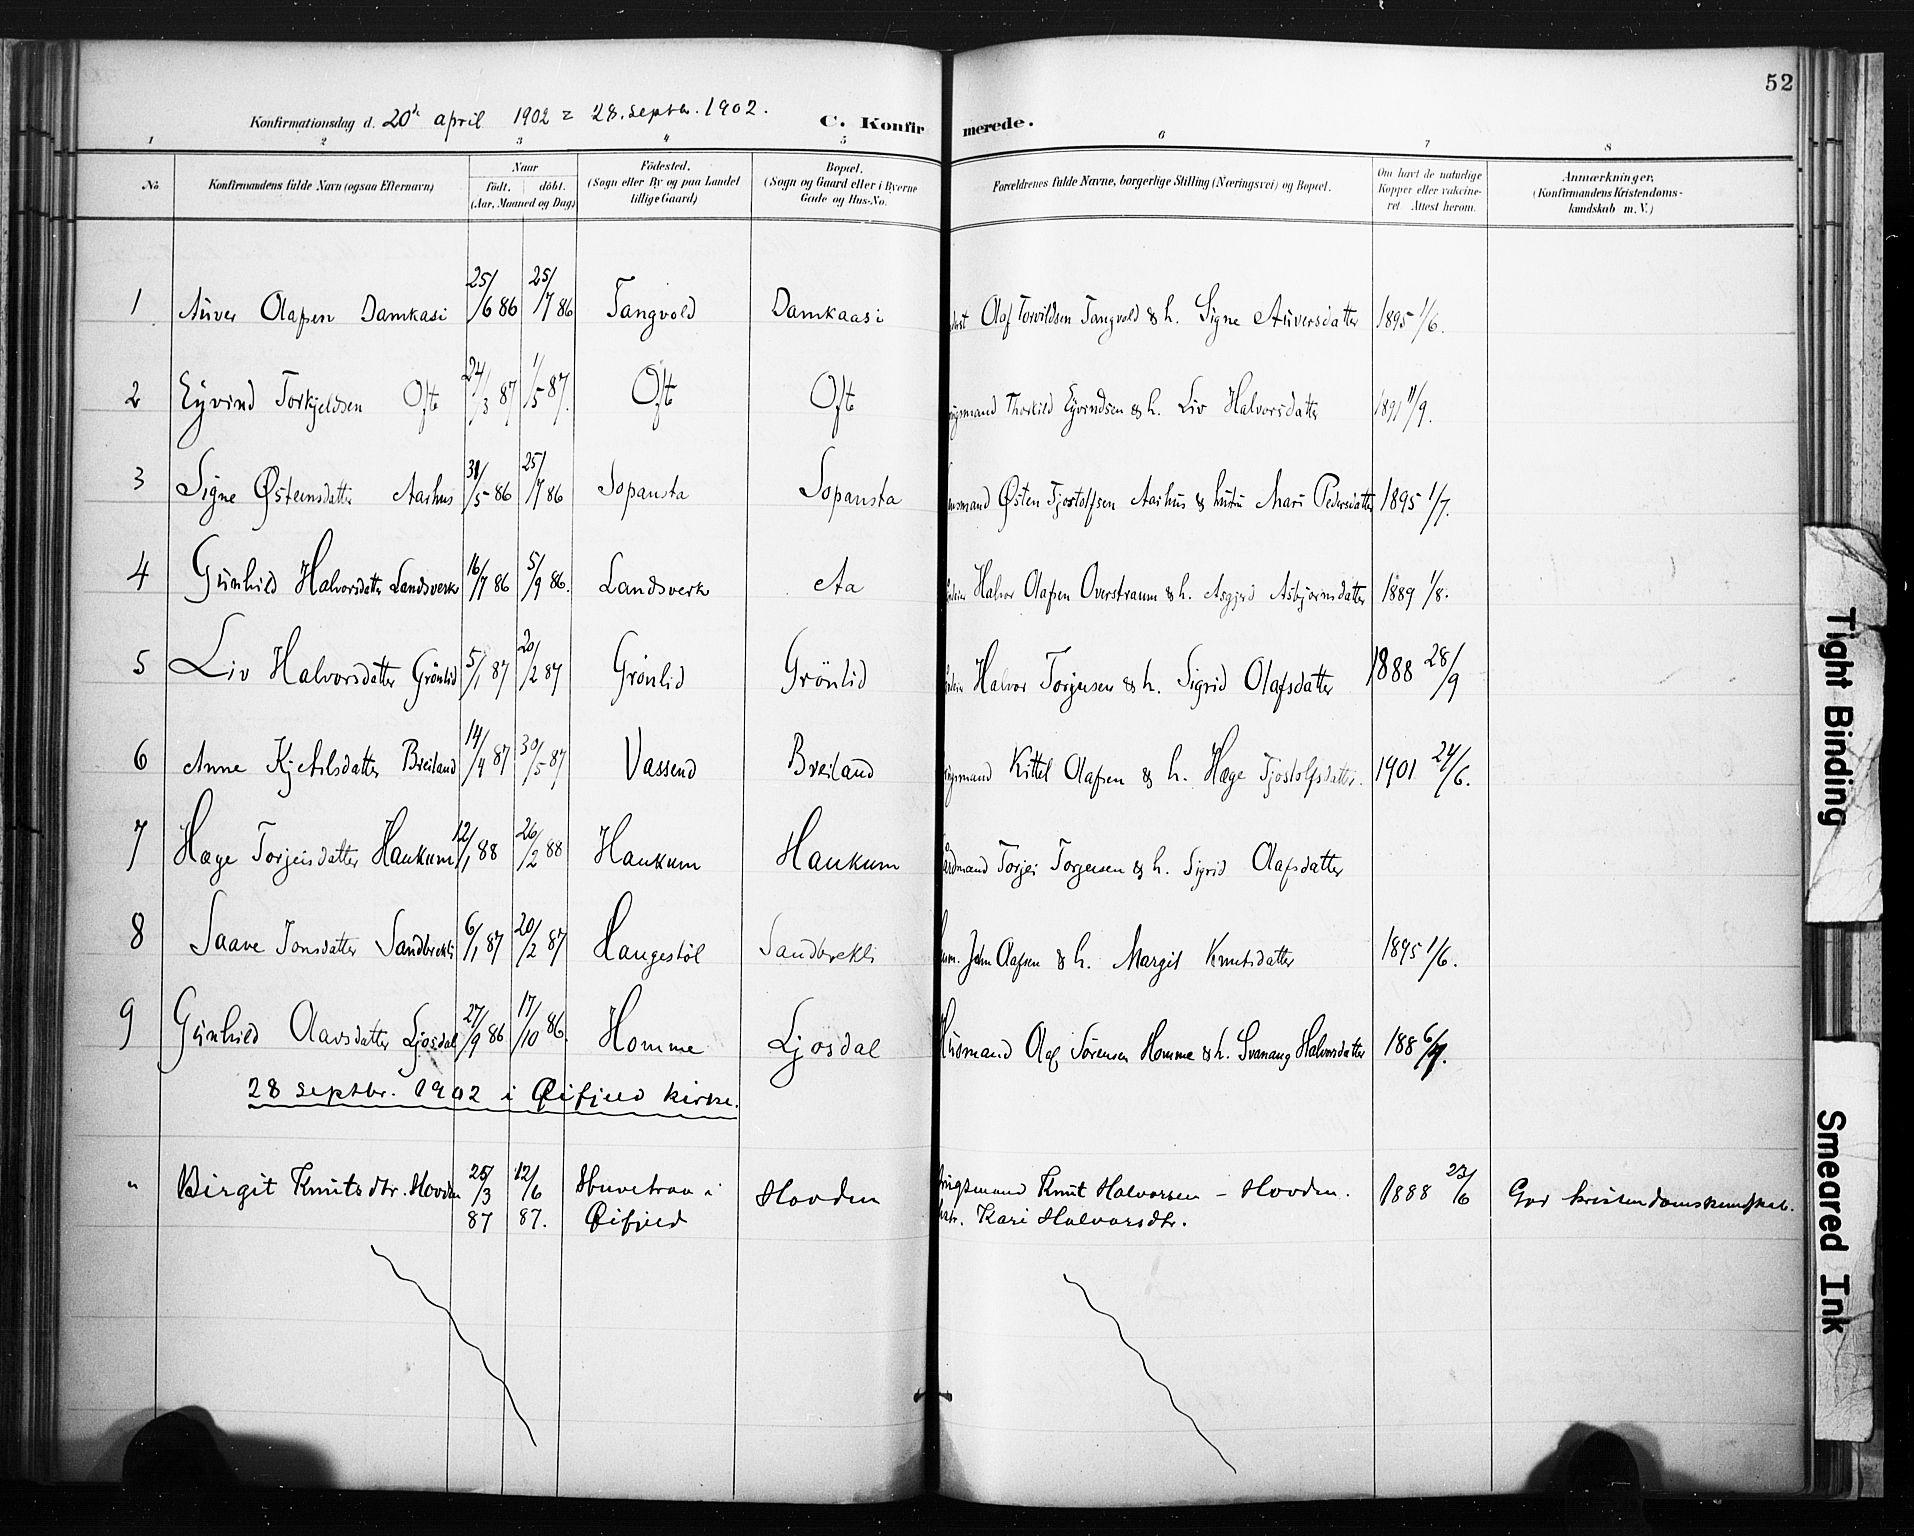 SAKO, Lårdal kirkebøker, F/Fc/L0002: Ministerialbok nr. III 2, 1887-1906, s. 52